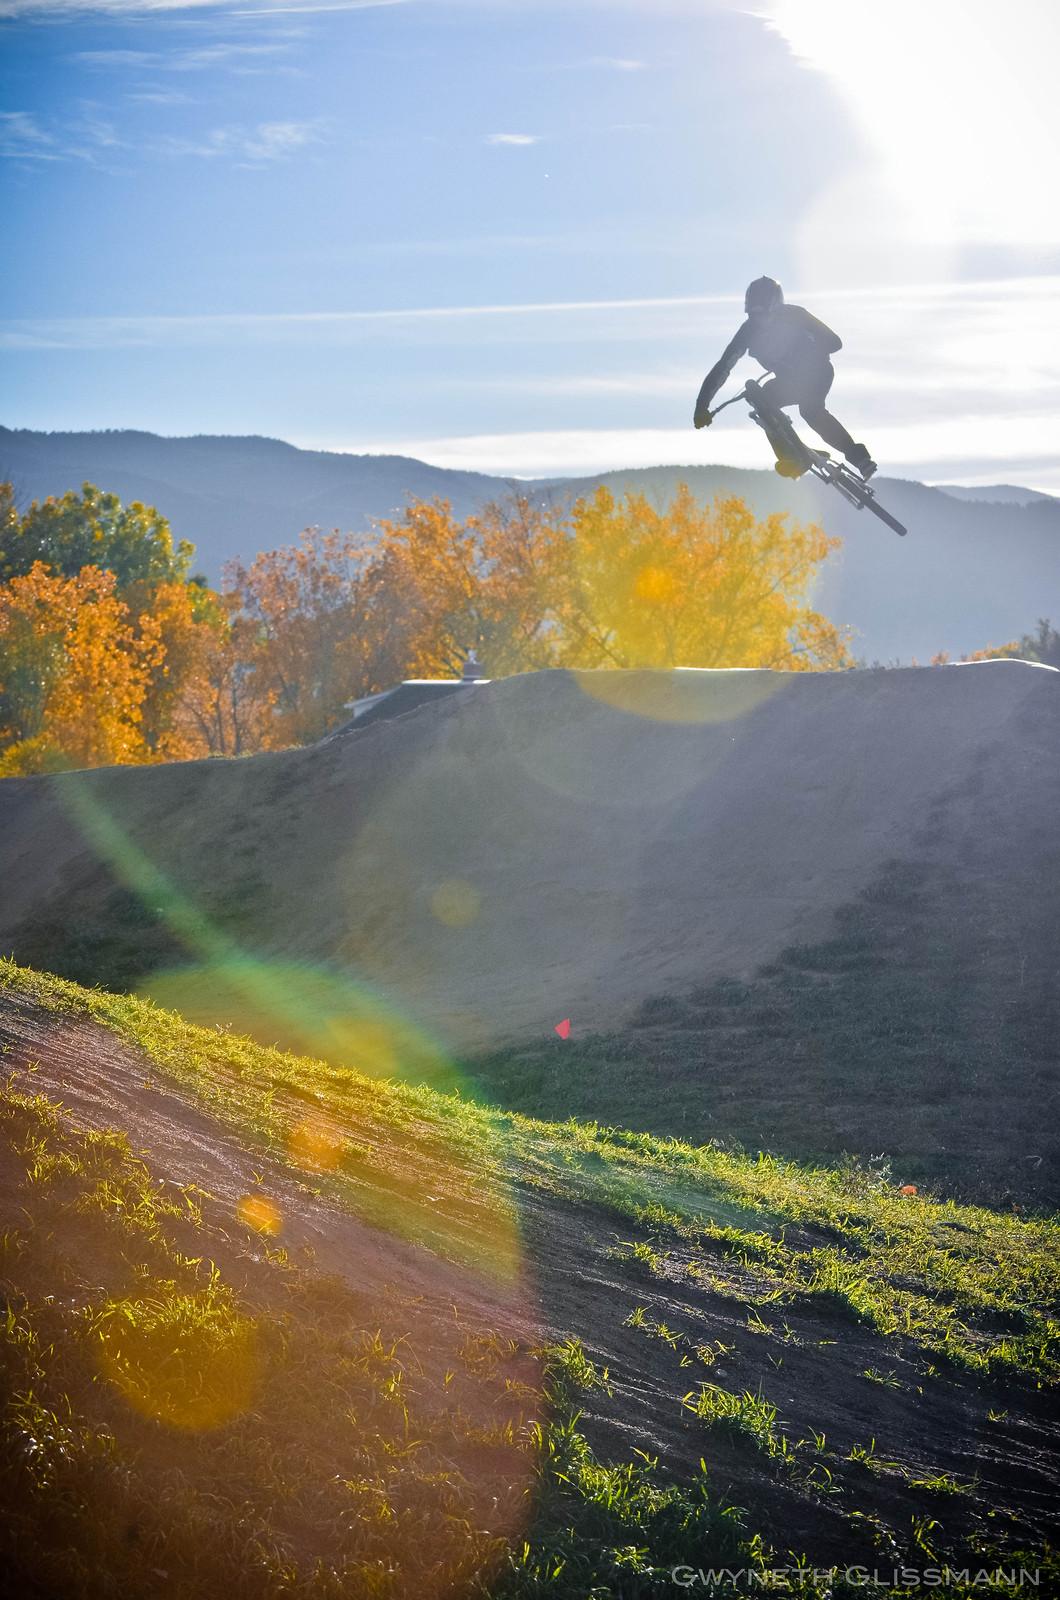 Valmont Bike Park - rhiannon - Mountain Biking Pictures - Vital MTB